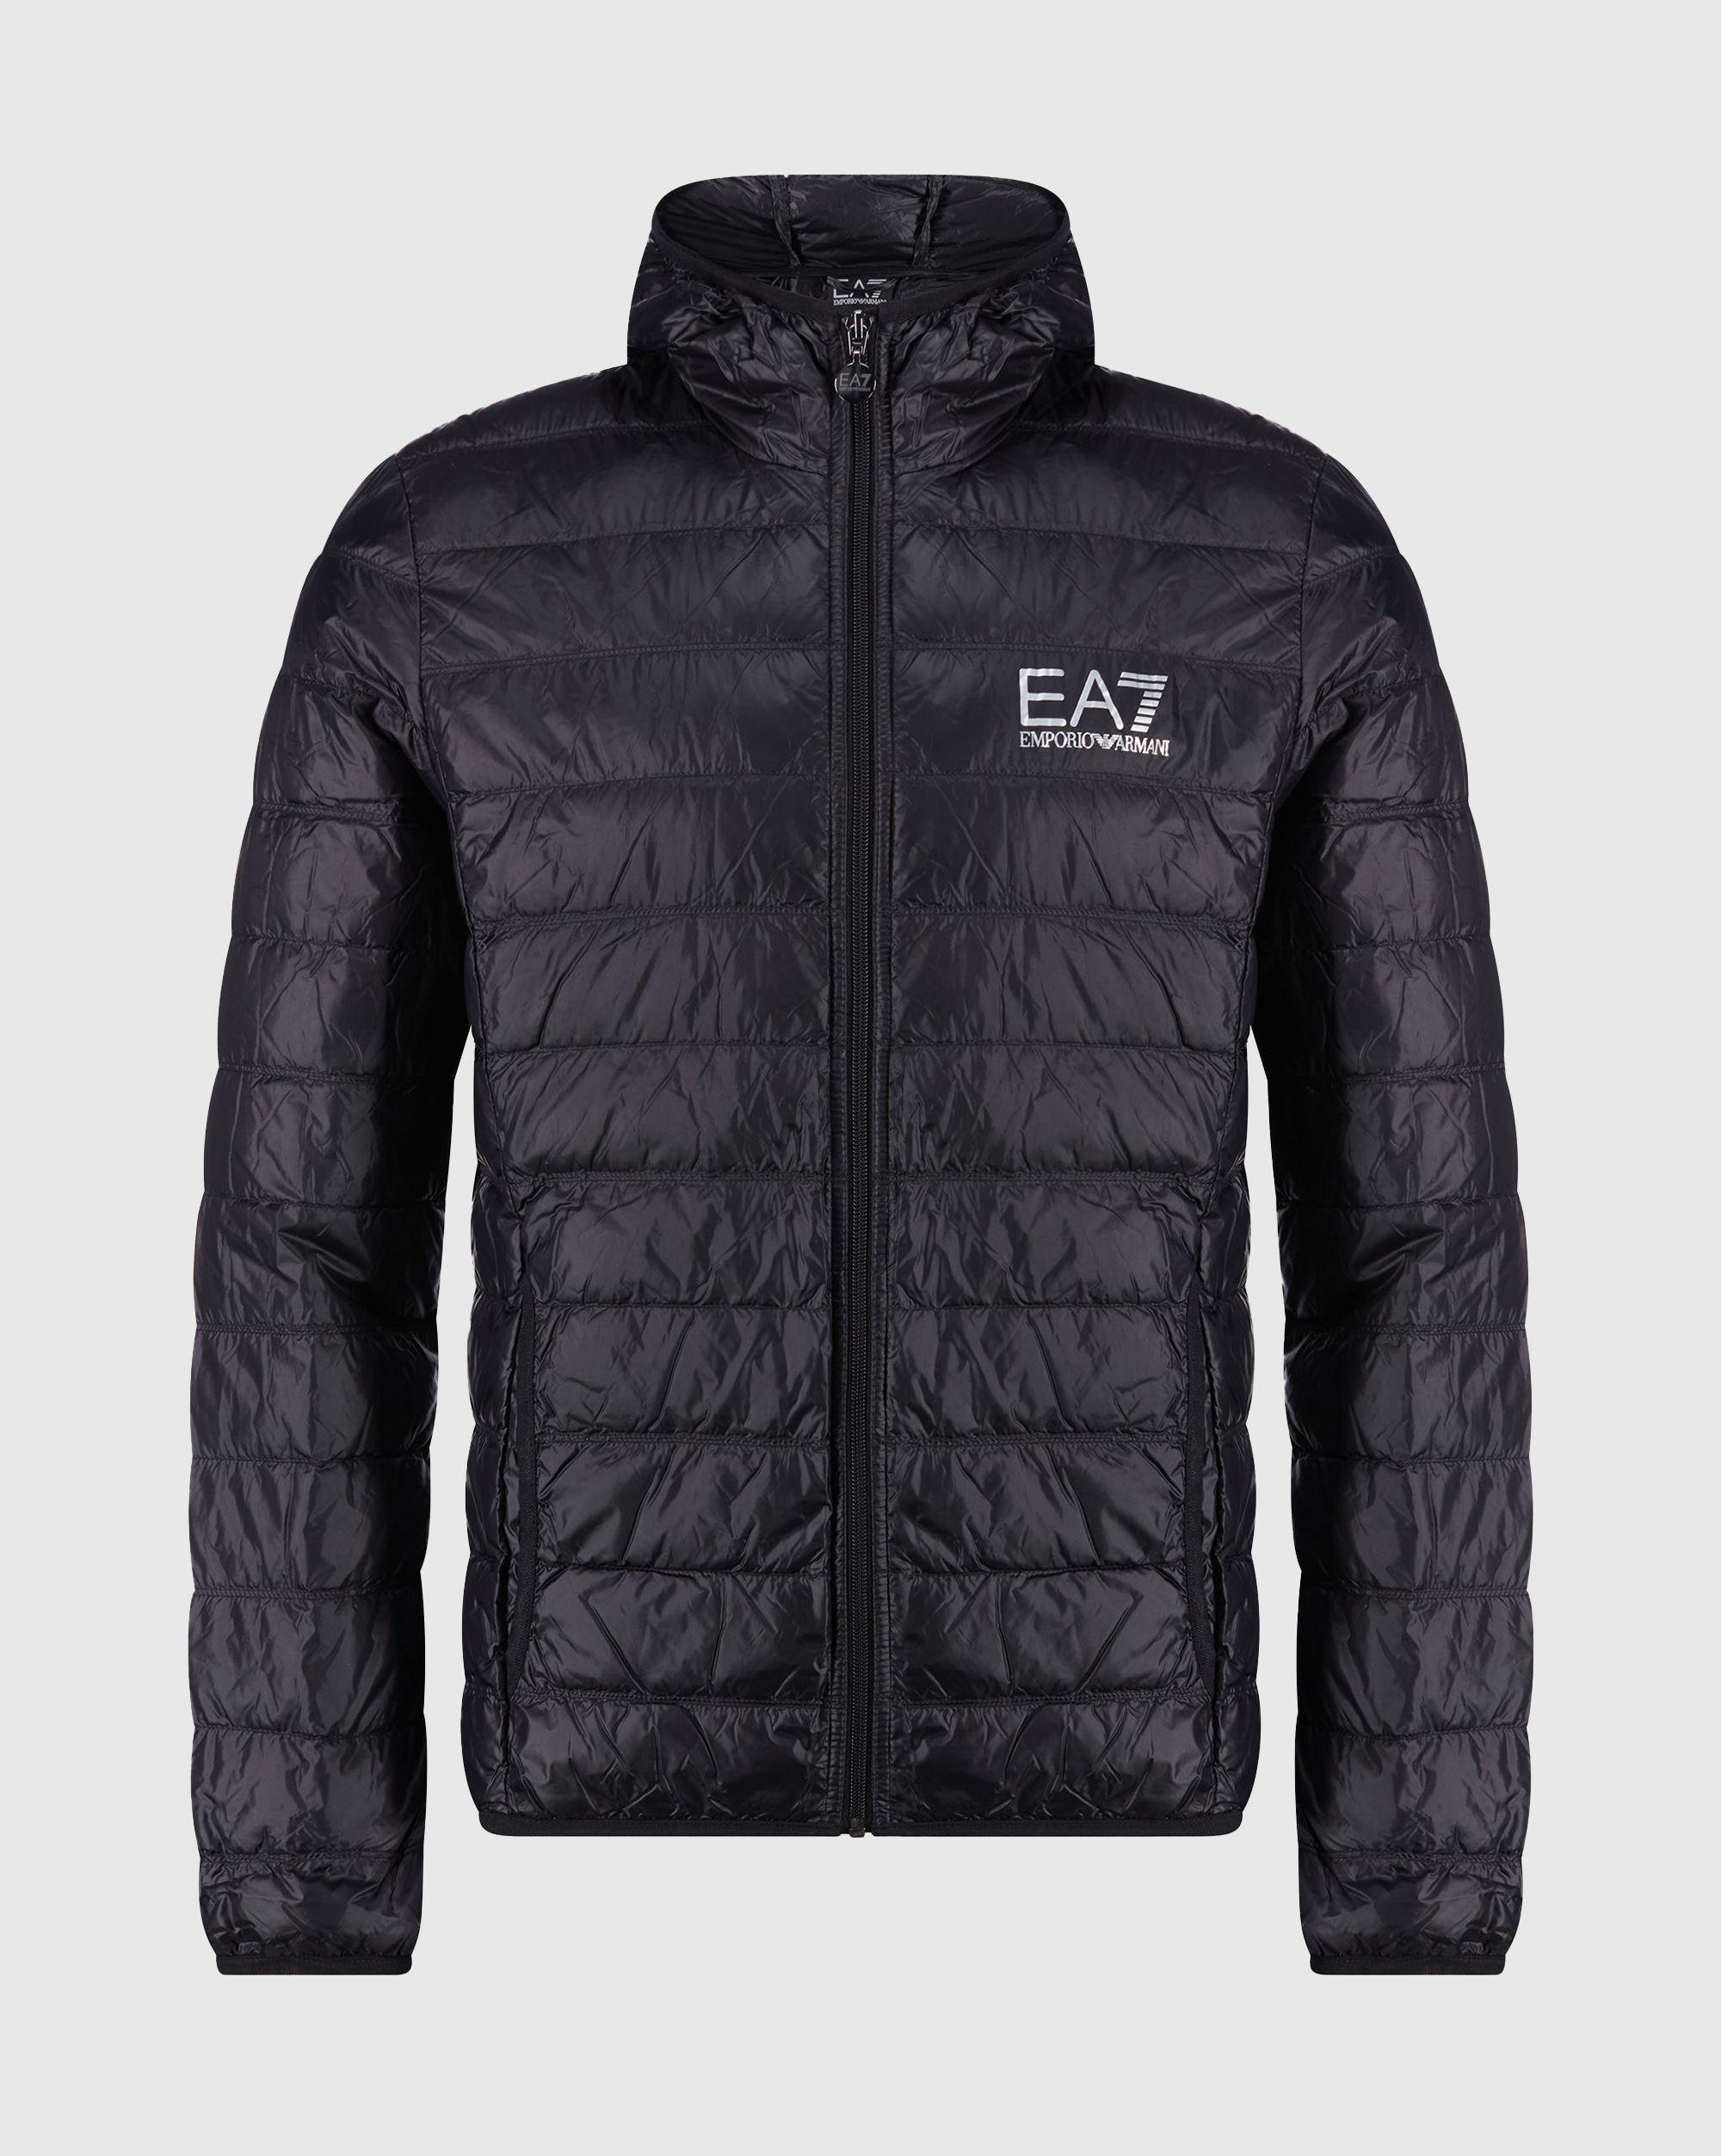 EA7 Giacca Piumino Nero Uomo